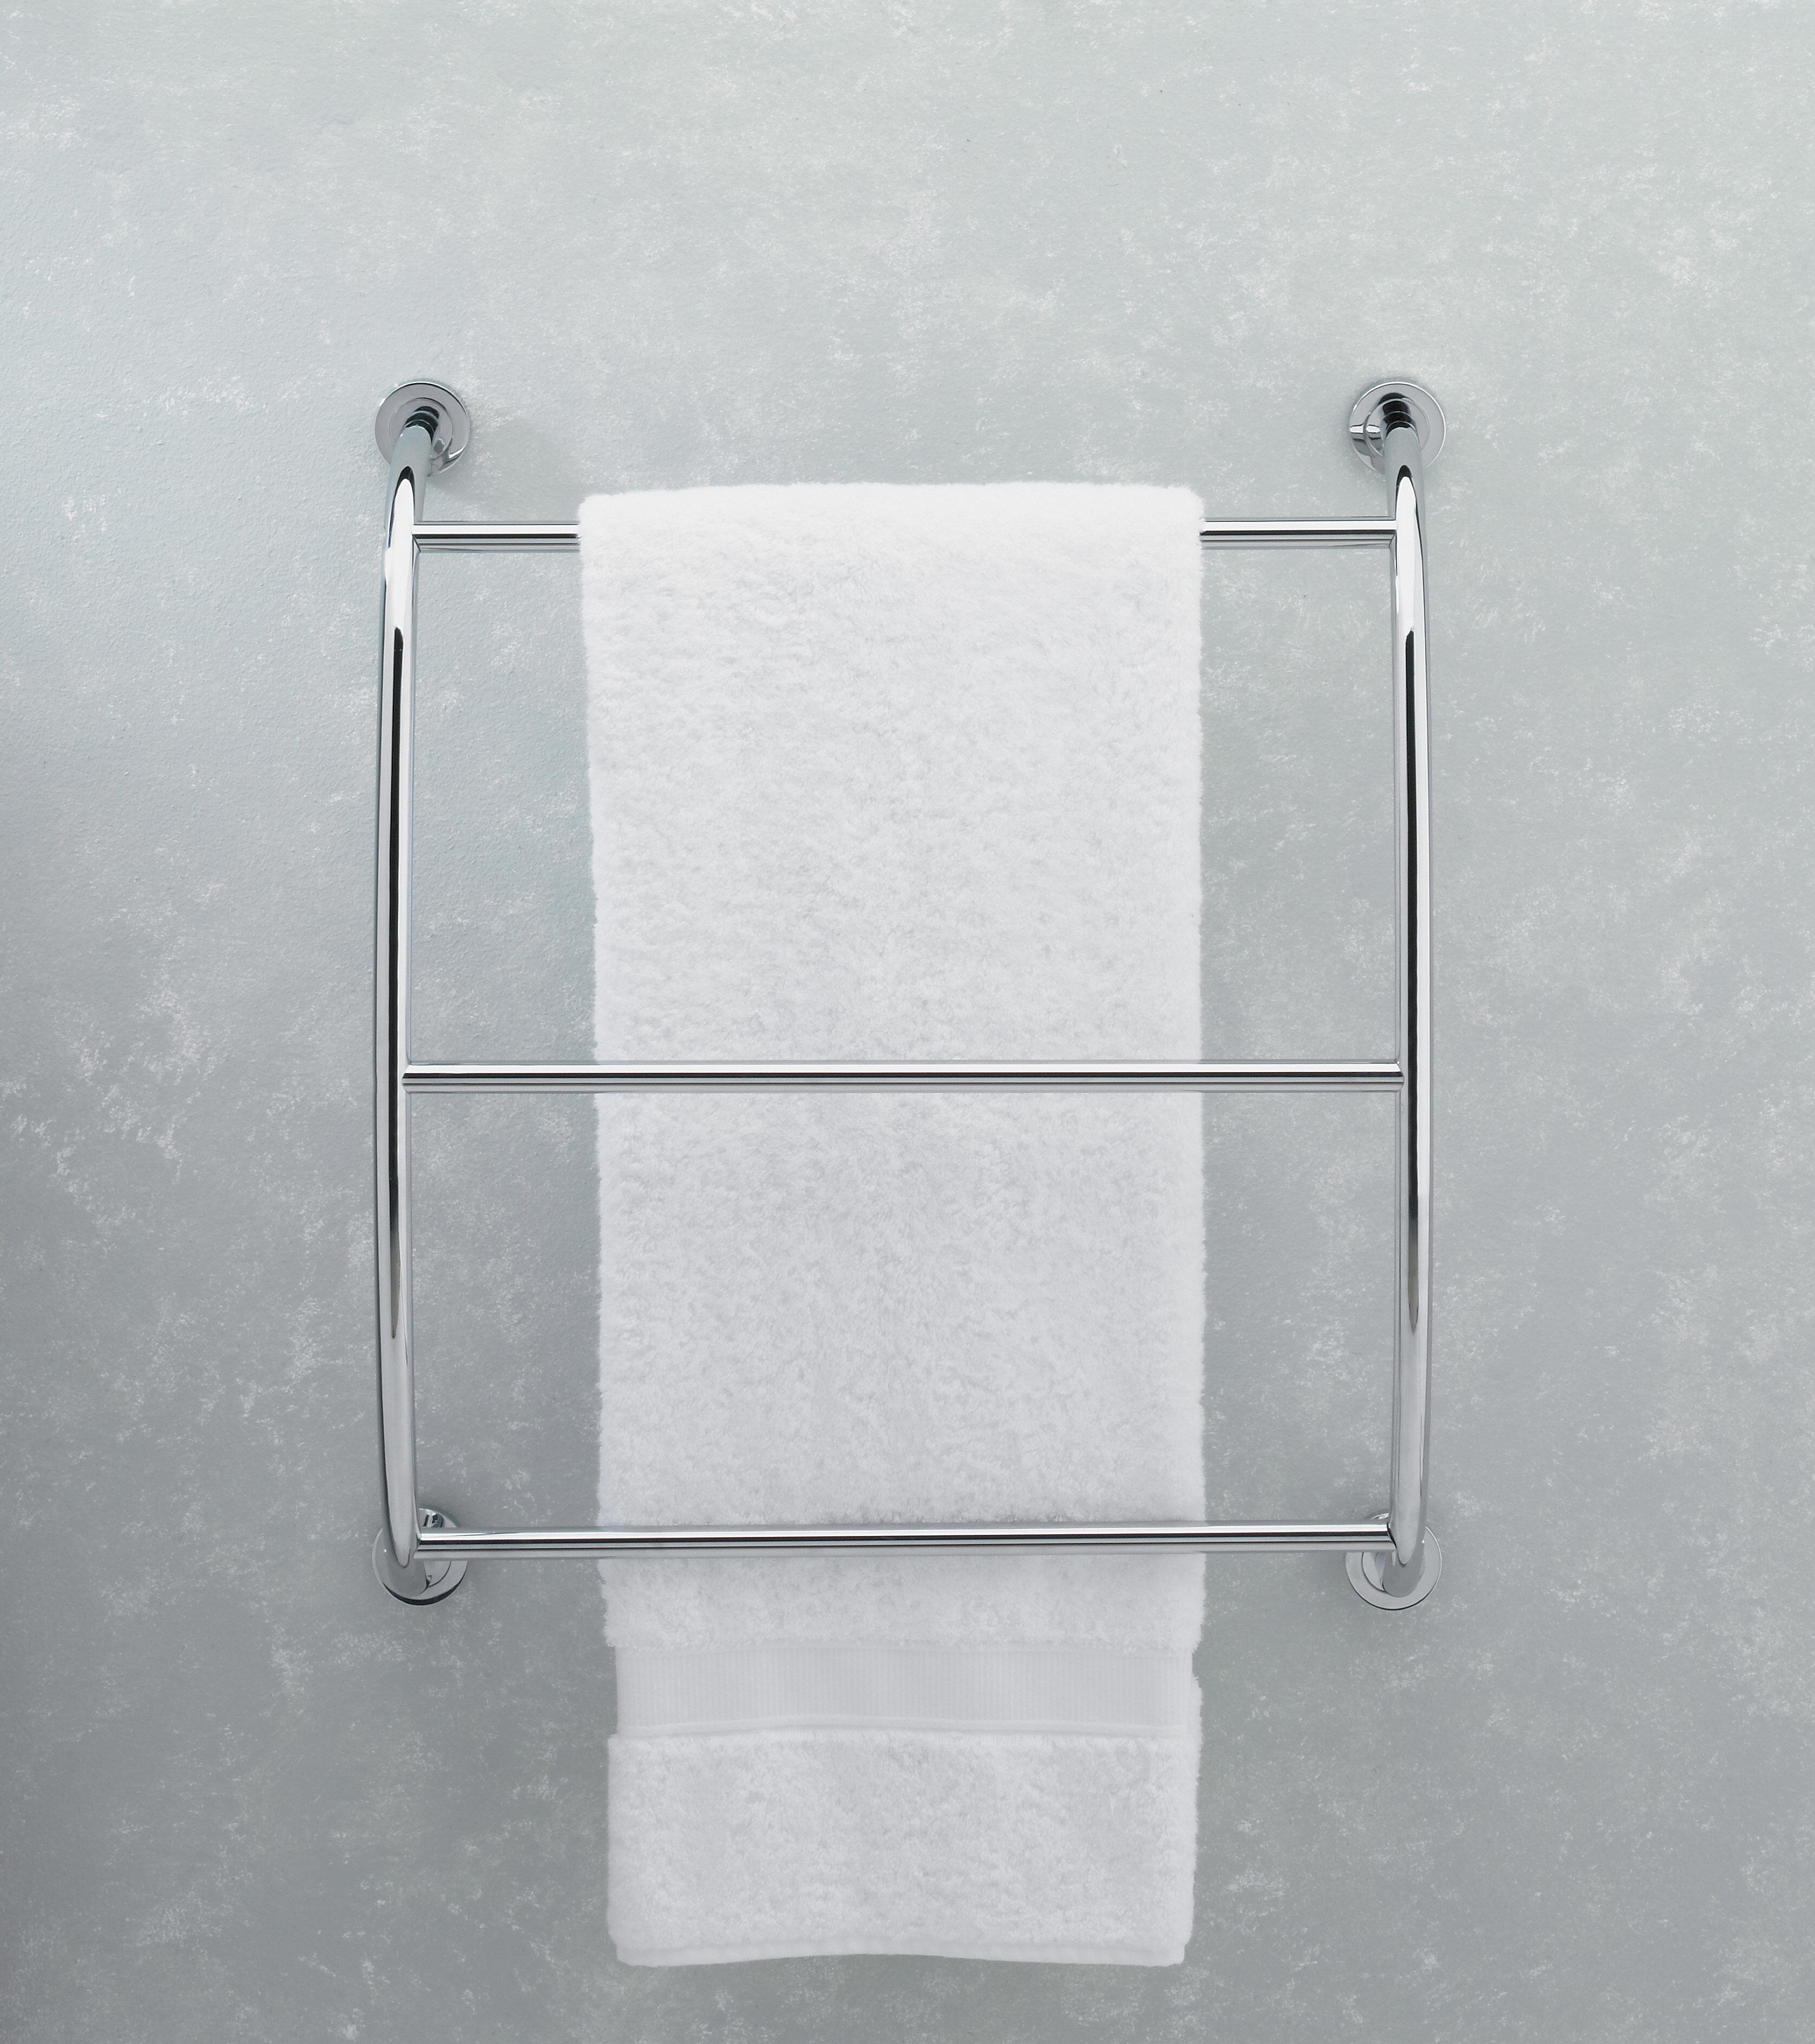 Symple Stuff Galesville Wall Mounted Towel Rack Reviews Wayfair Ca